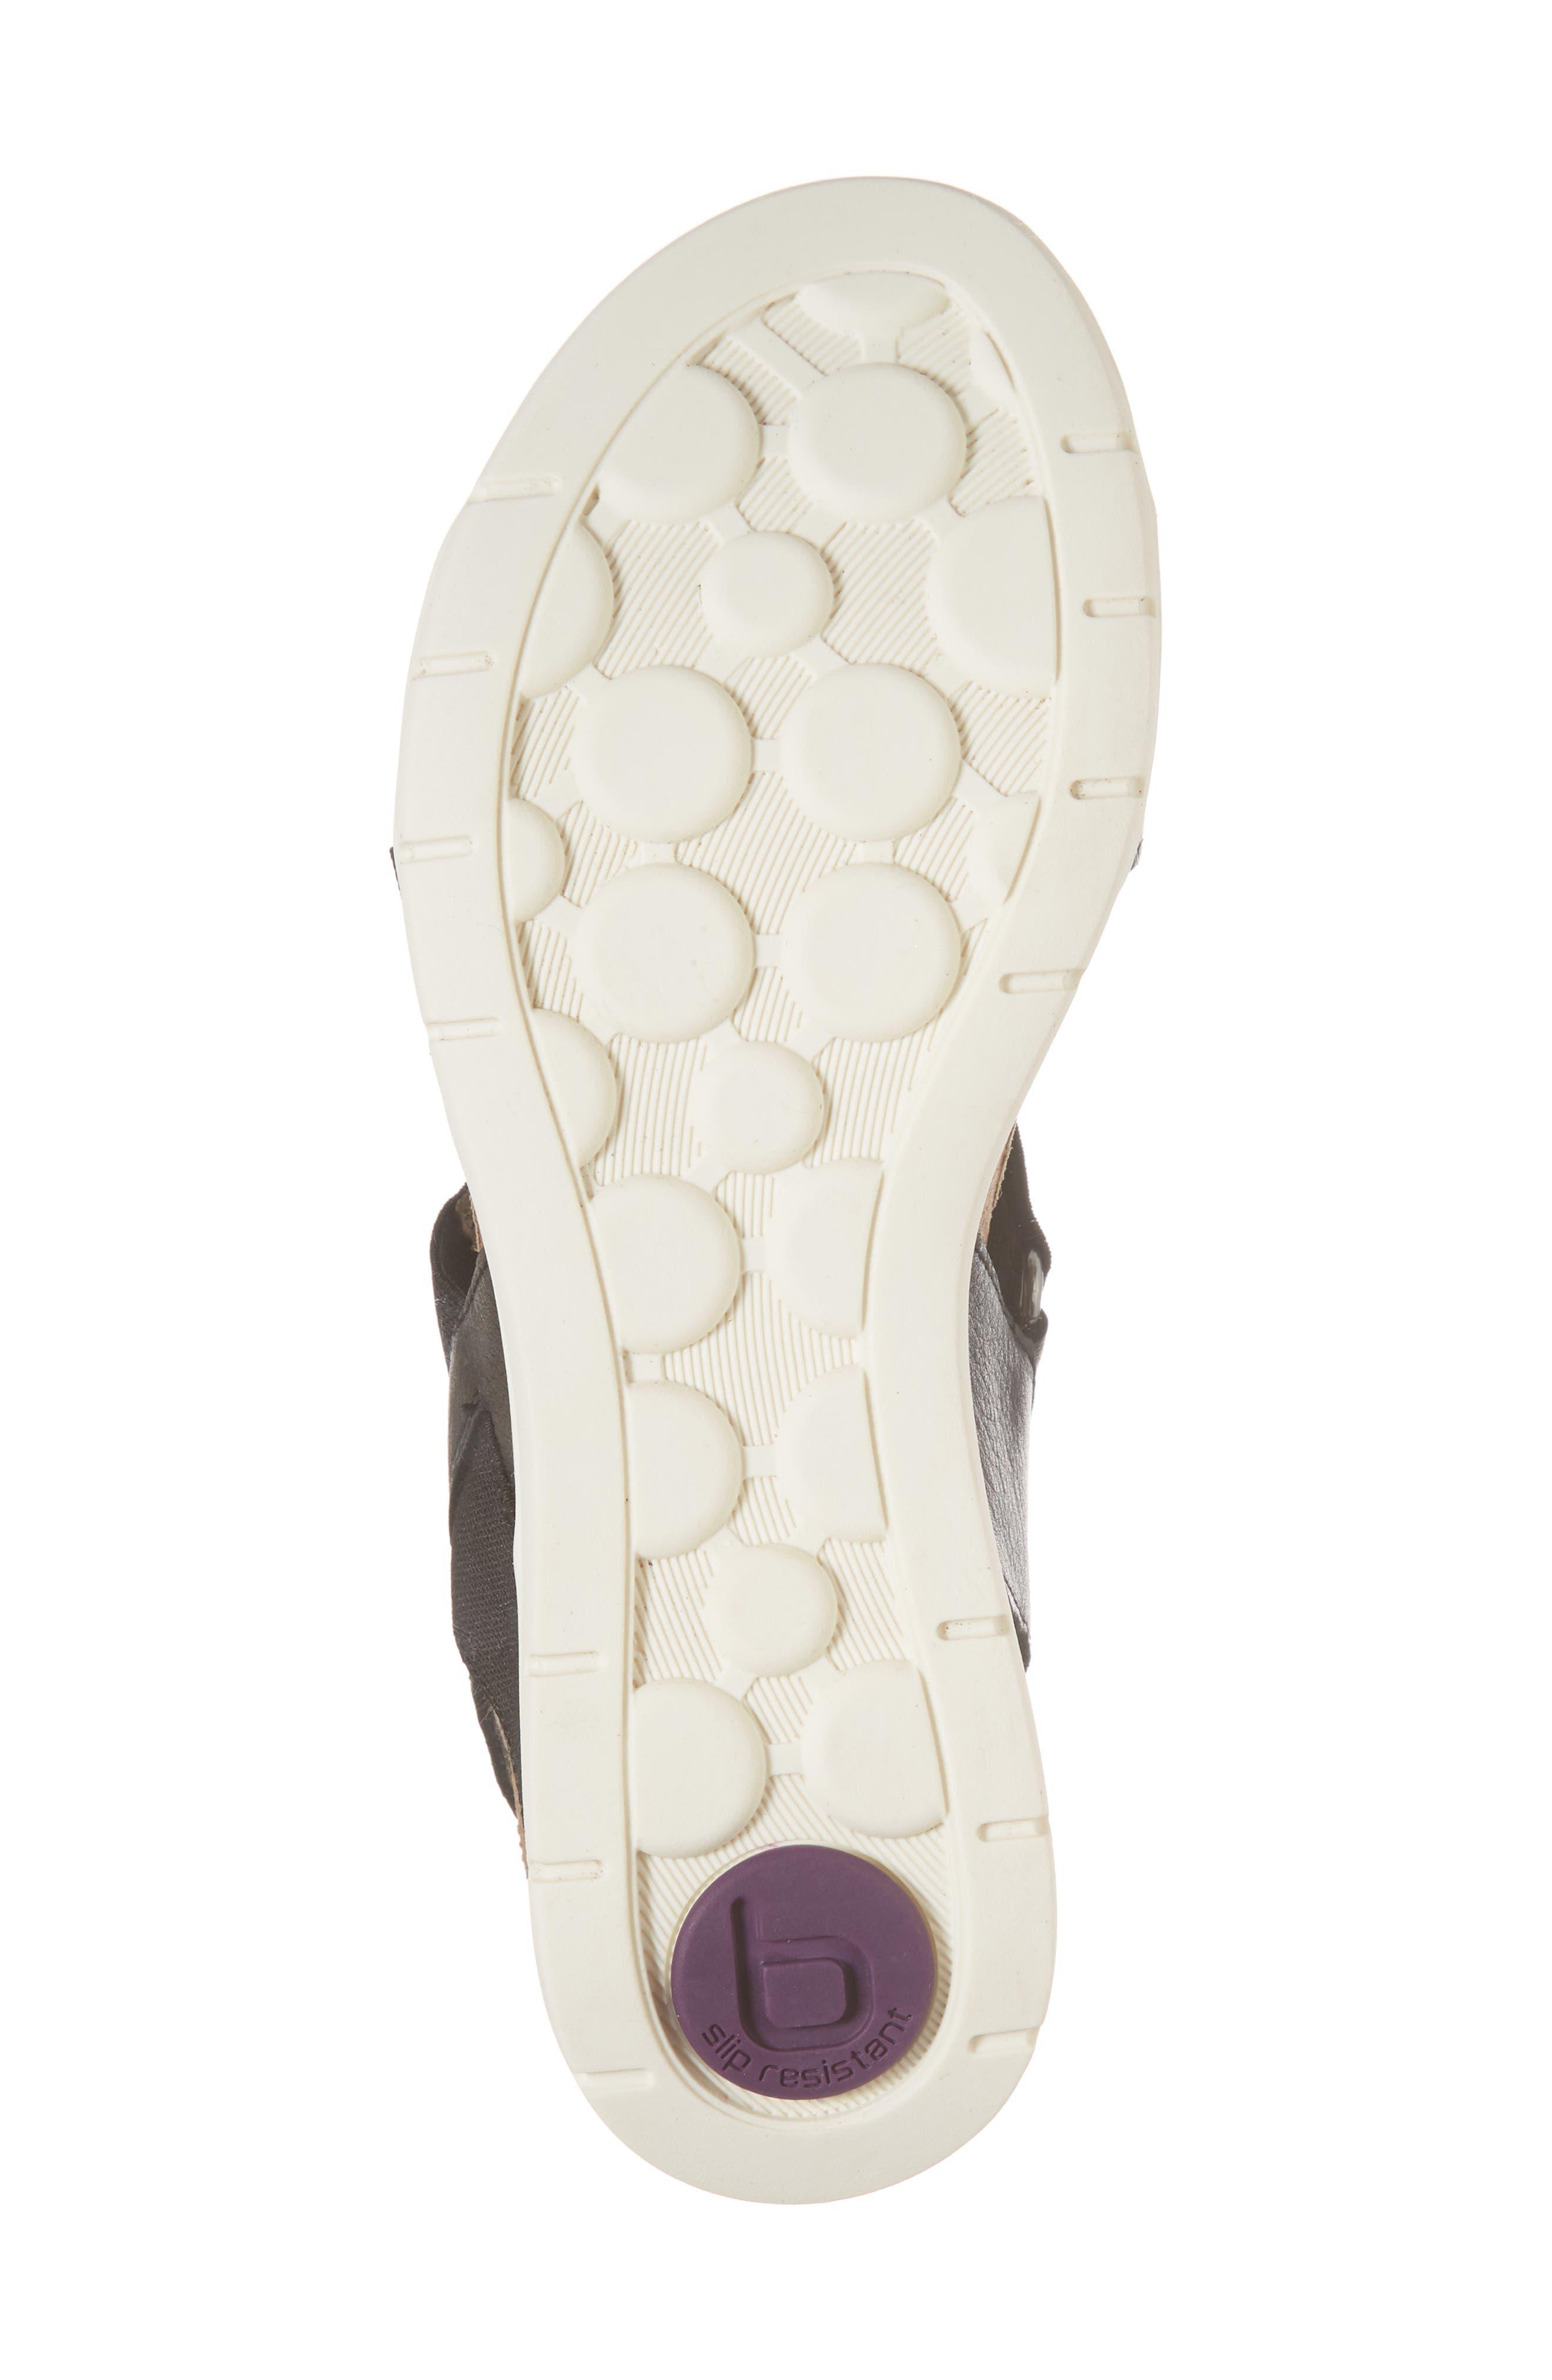 Paisley Wedge Sandal,                             Alternate thumbnail 21, color,